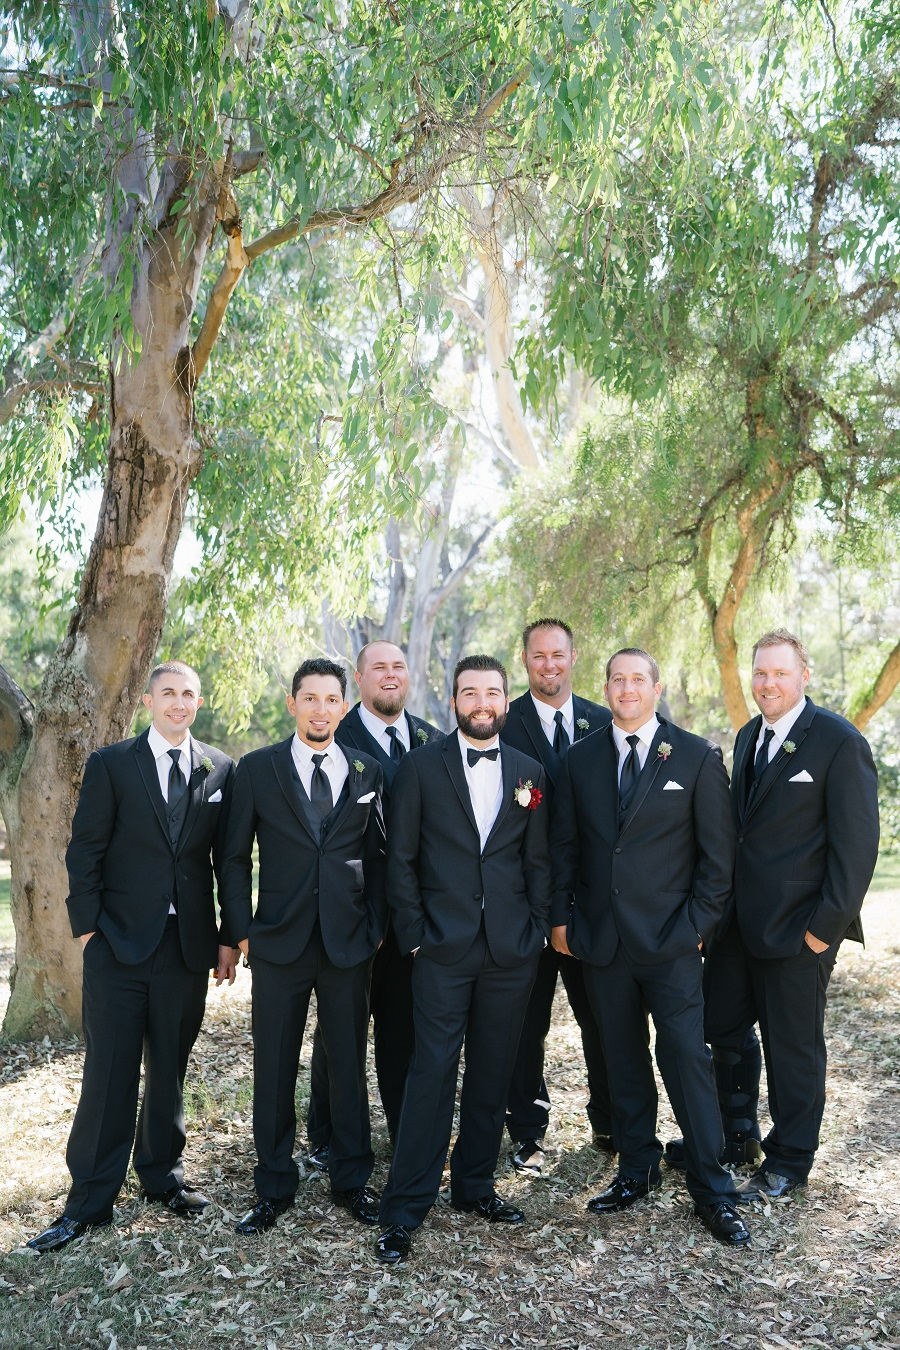 A Signature Wedding, Flowers by Cina, Jim Kennedy Photographers, Waterfront Hilton Wedding, seaside wedding, beach wedding, berry wedding